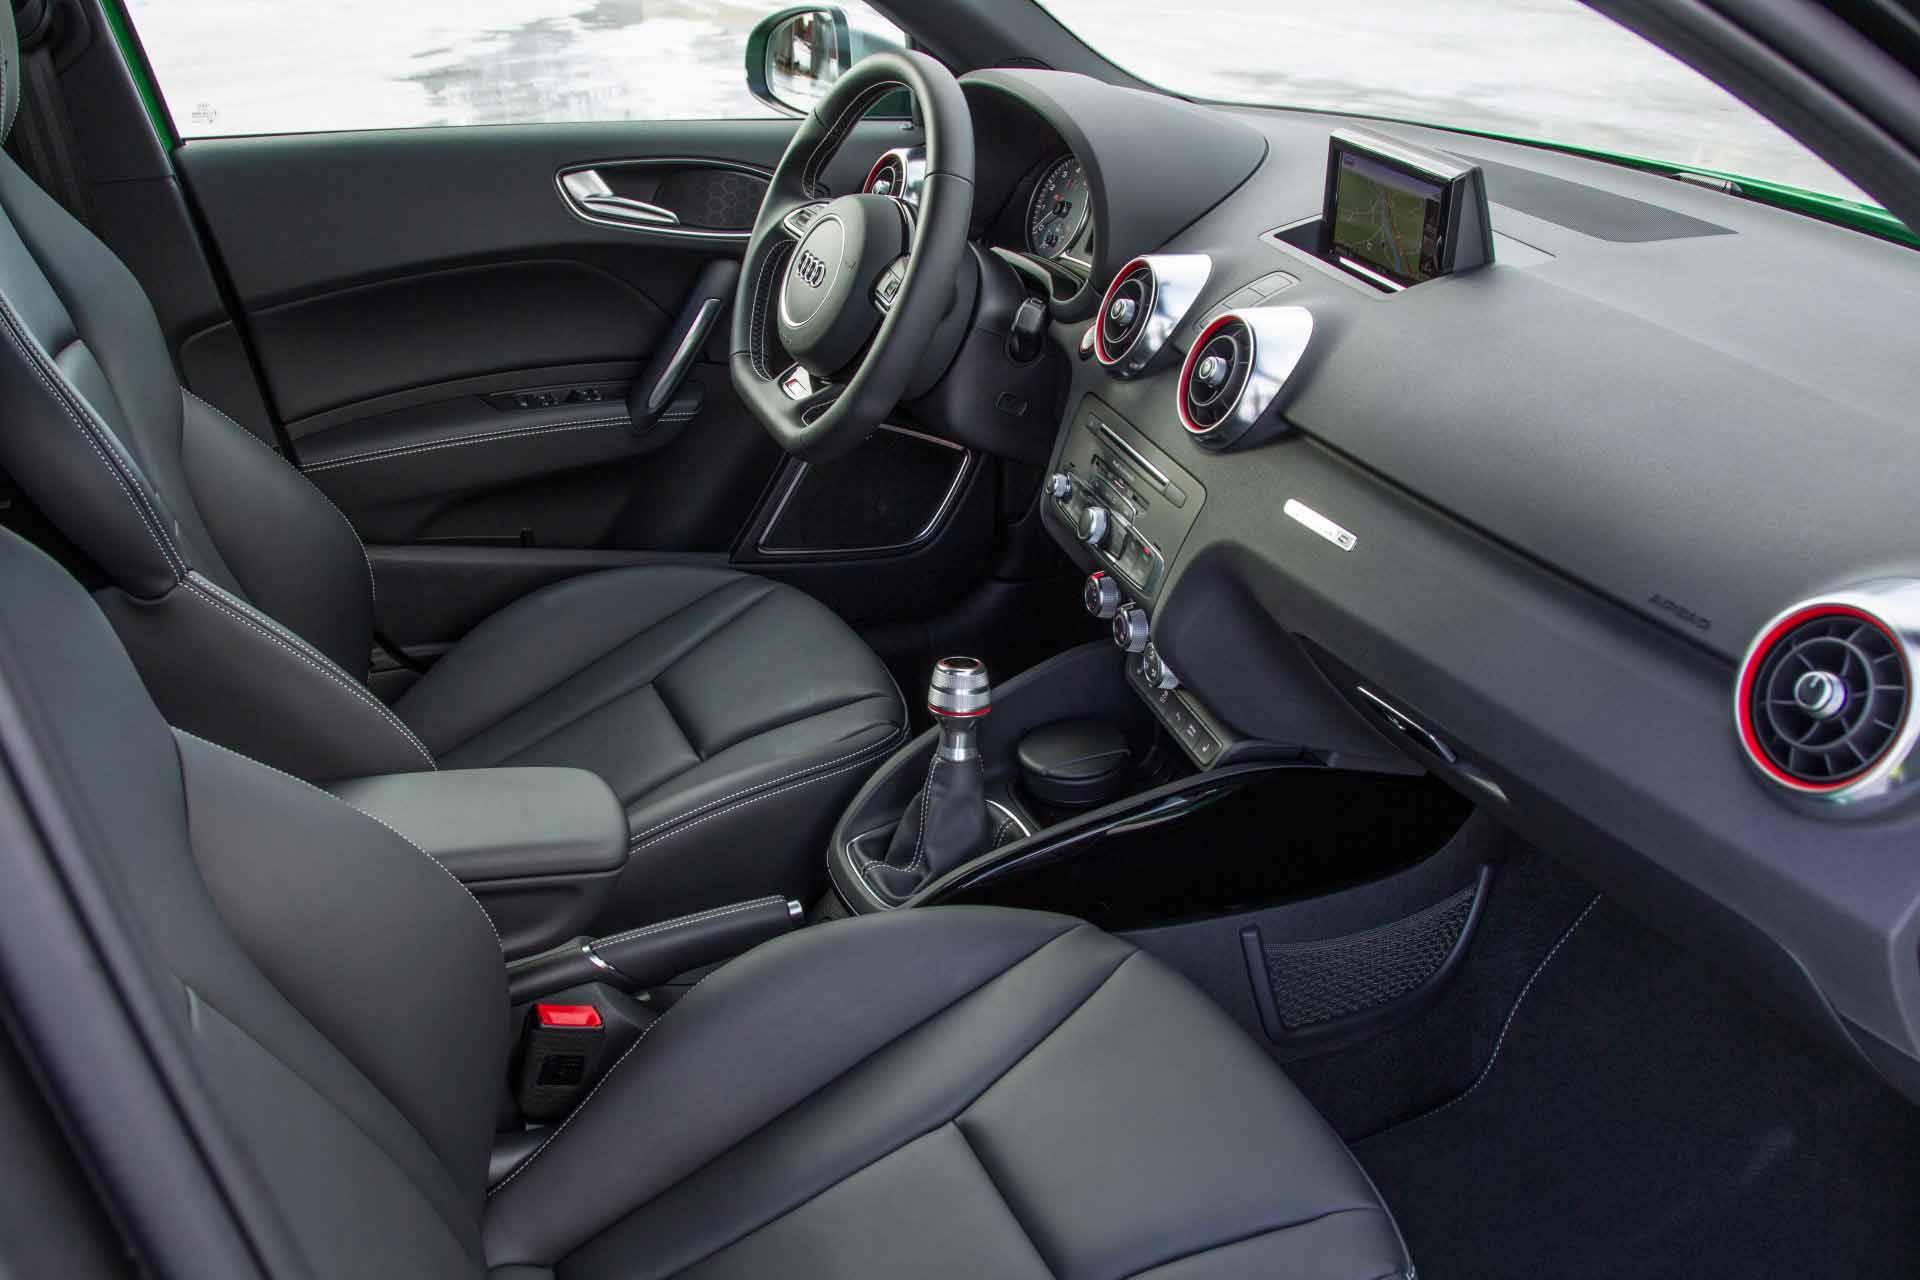 _Audi-S1-innen-vorne